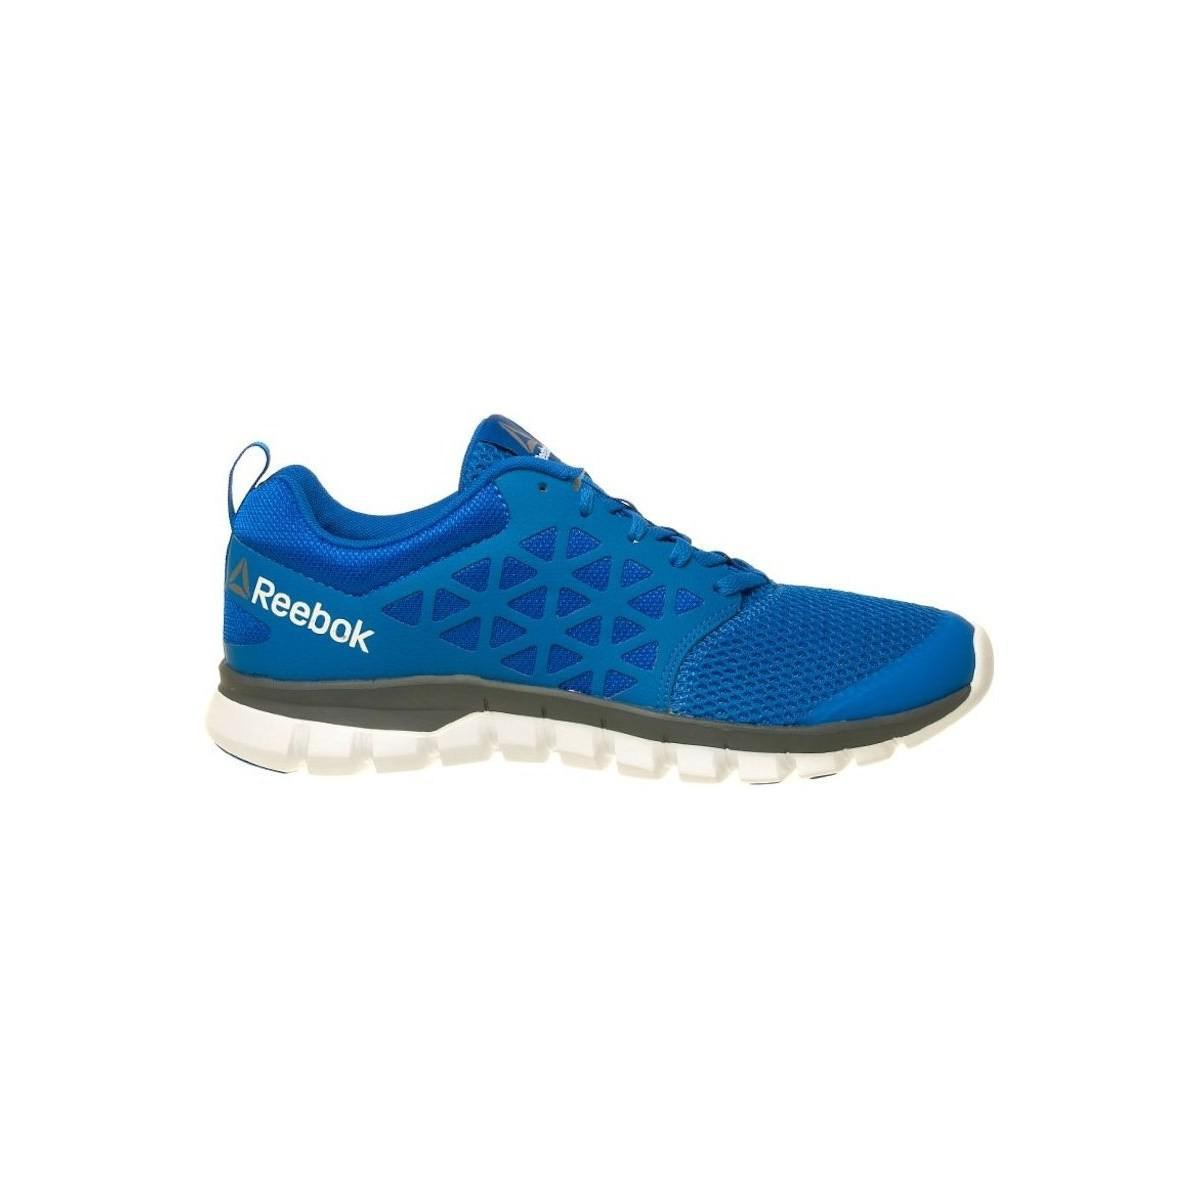 Reebok - Sublite Xt Cushion Men s Running Trainers In Blue for Men - Lyst.  View fullscreen fc8927f52